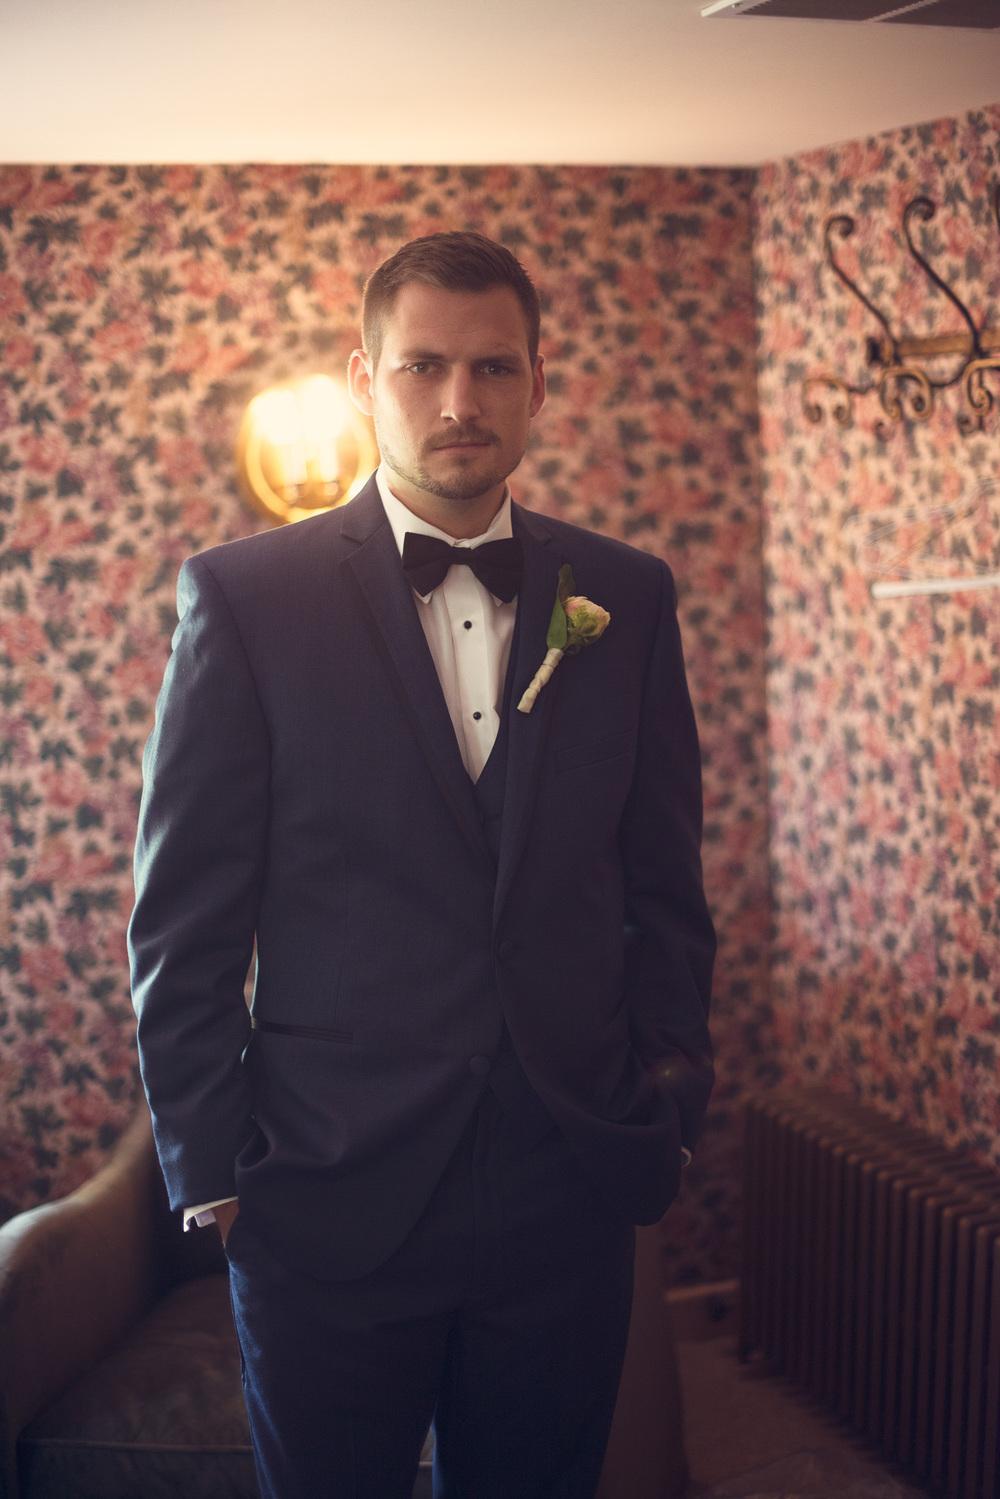 groomsmen tuxedo bowtie portrait THPHOTO